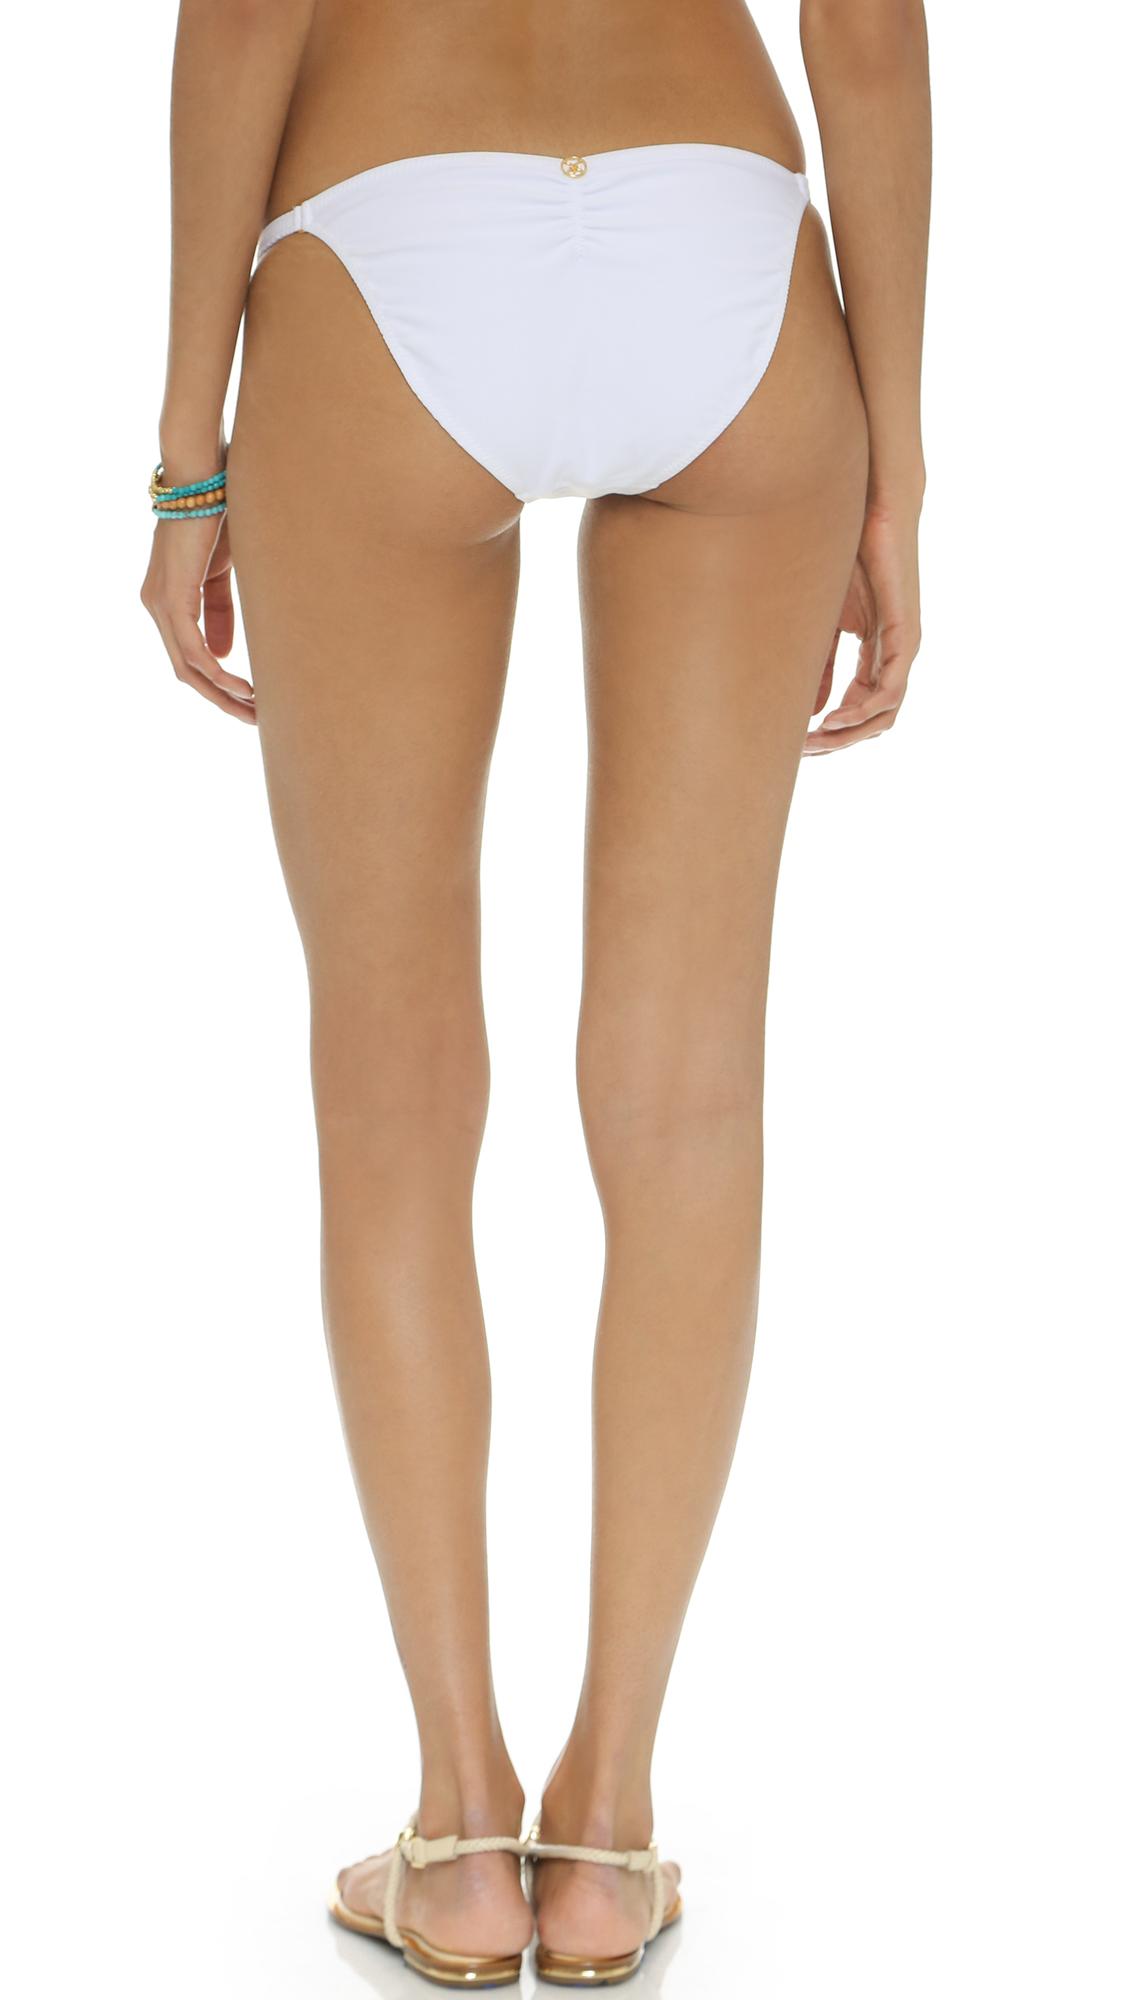 Lyst Vix Sold White Bikini Bottoms Solid White In White